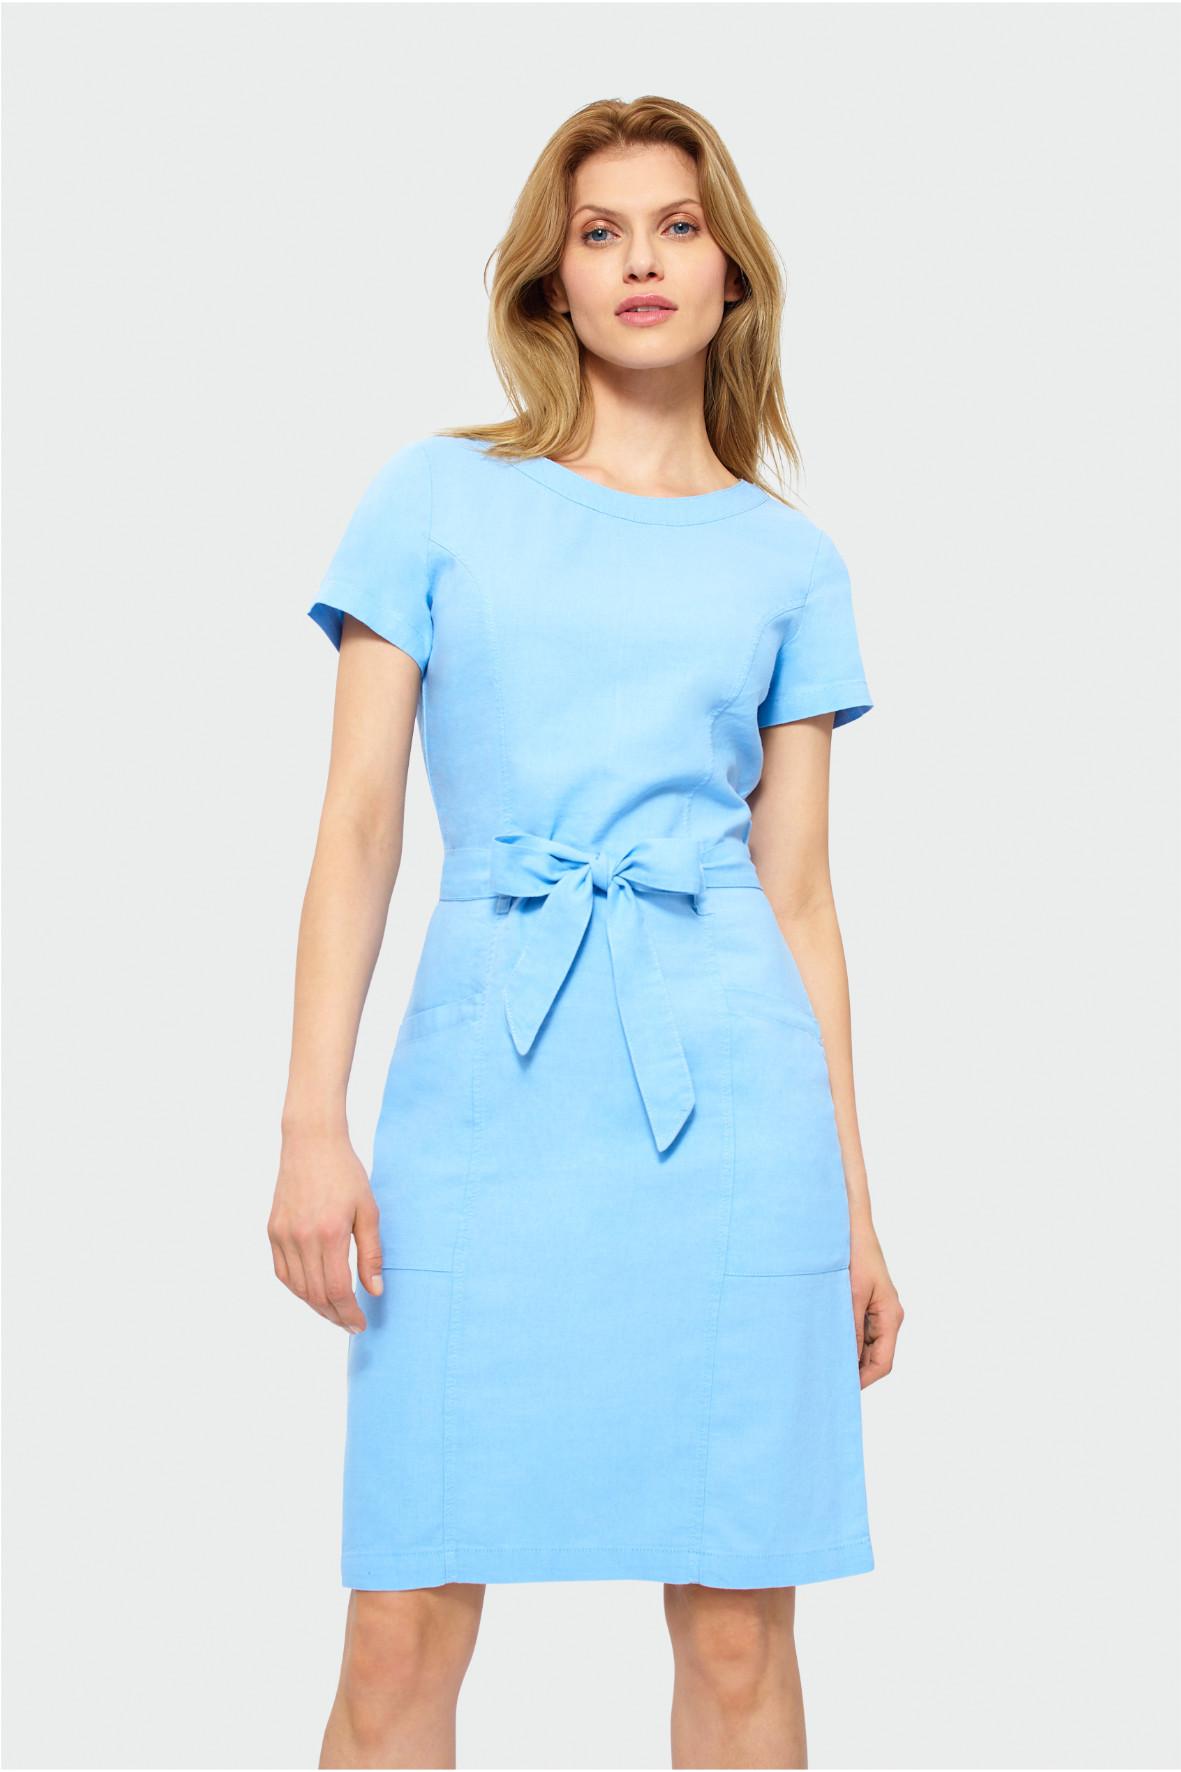 Niebieska sukienka odcięta w tali 8K38BM